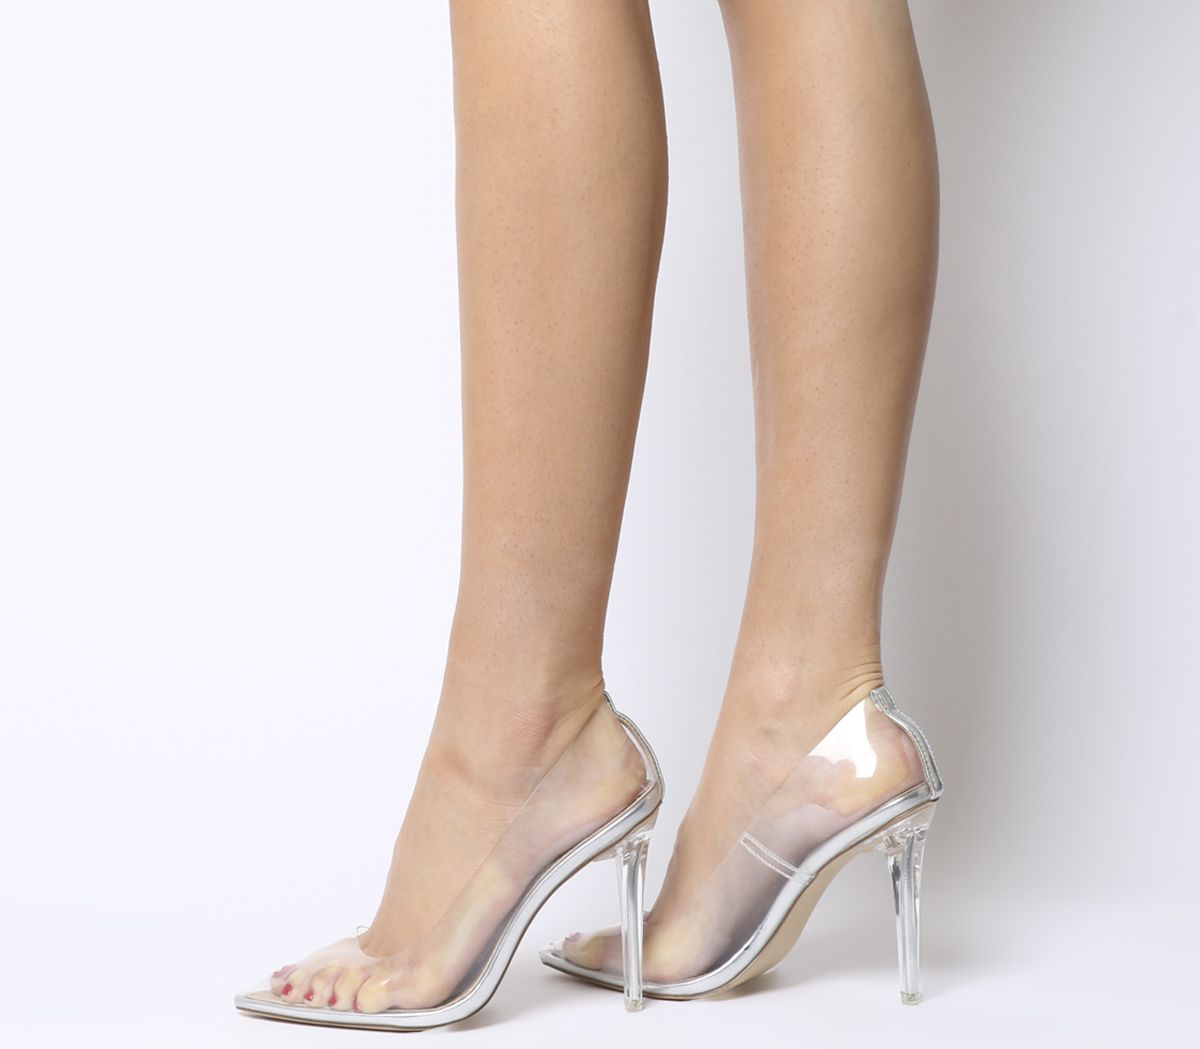 9a73832ae96 Office Hadie Transparent Heel Court Shoes Perspex - High Heels